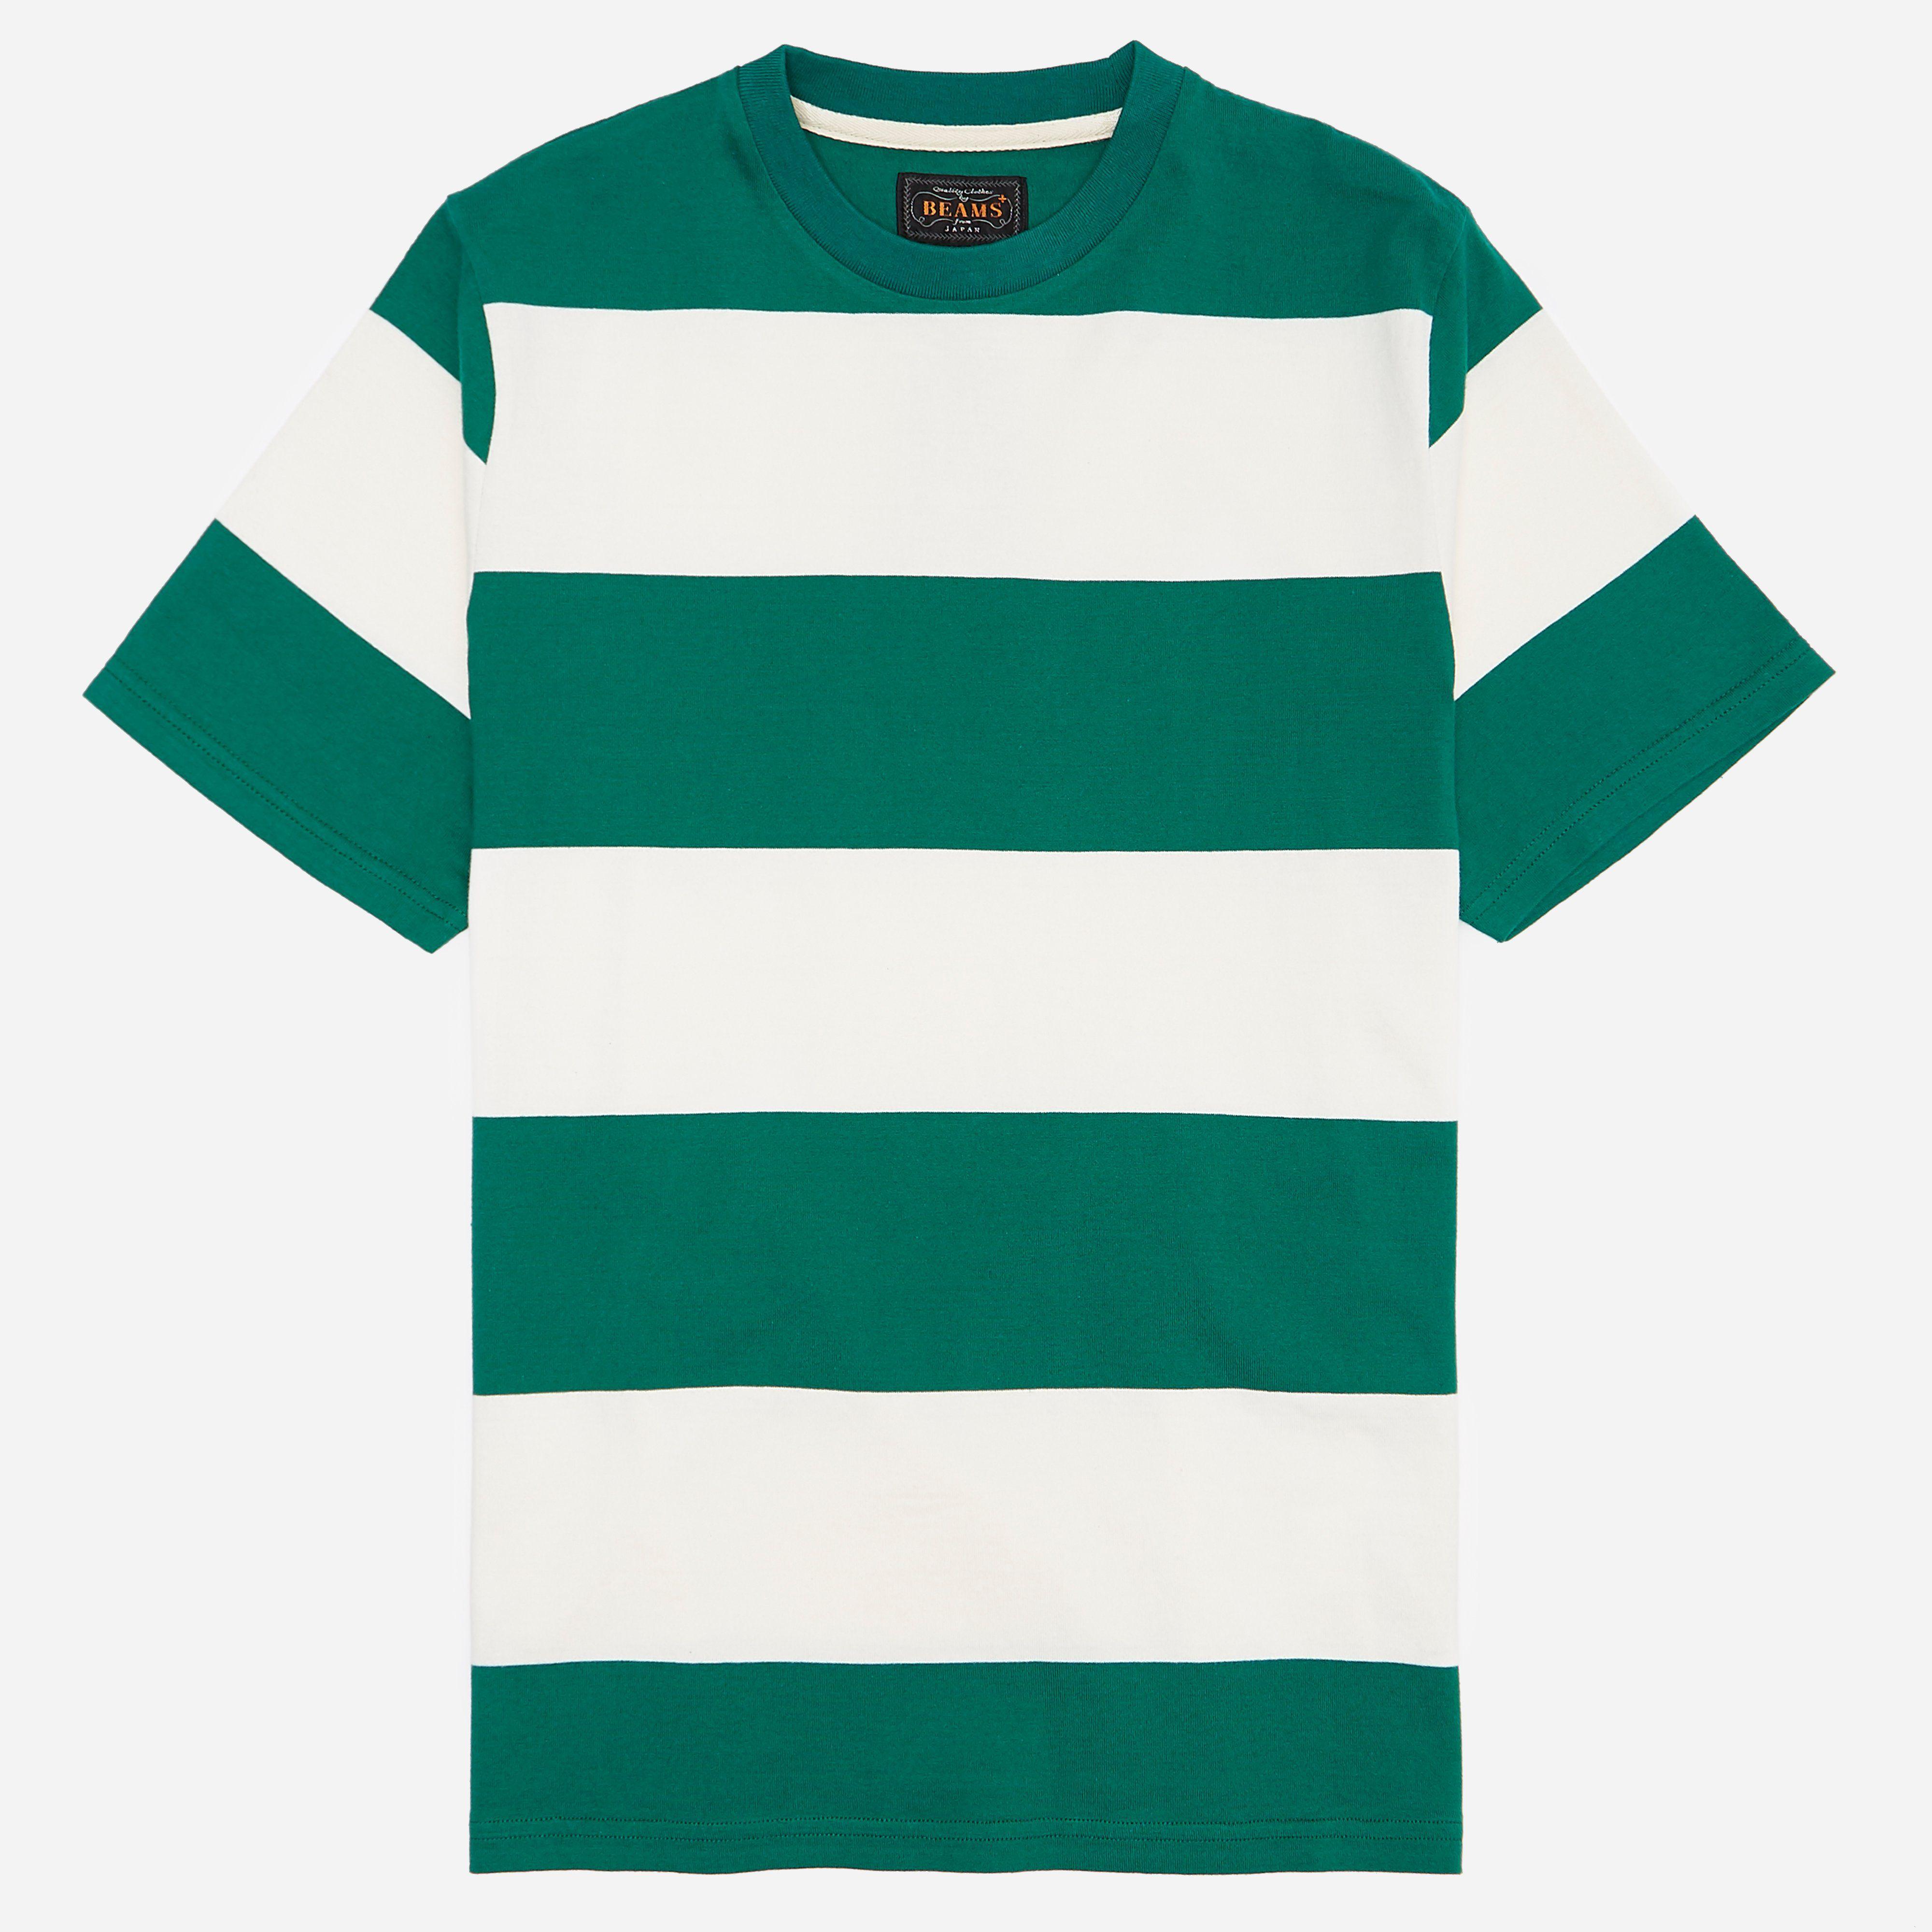 Beams Plus 4 Inch Border T-shirt